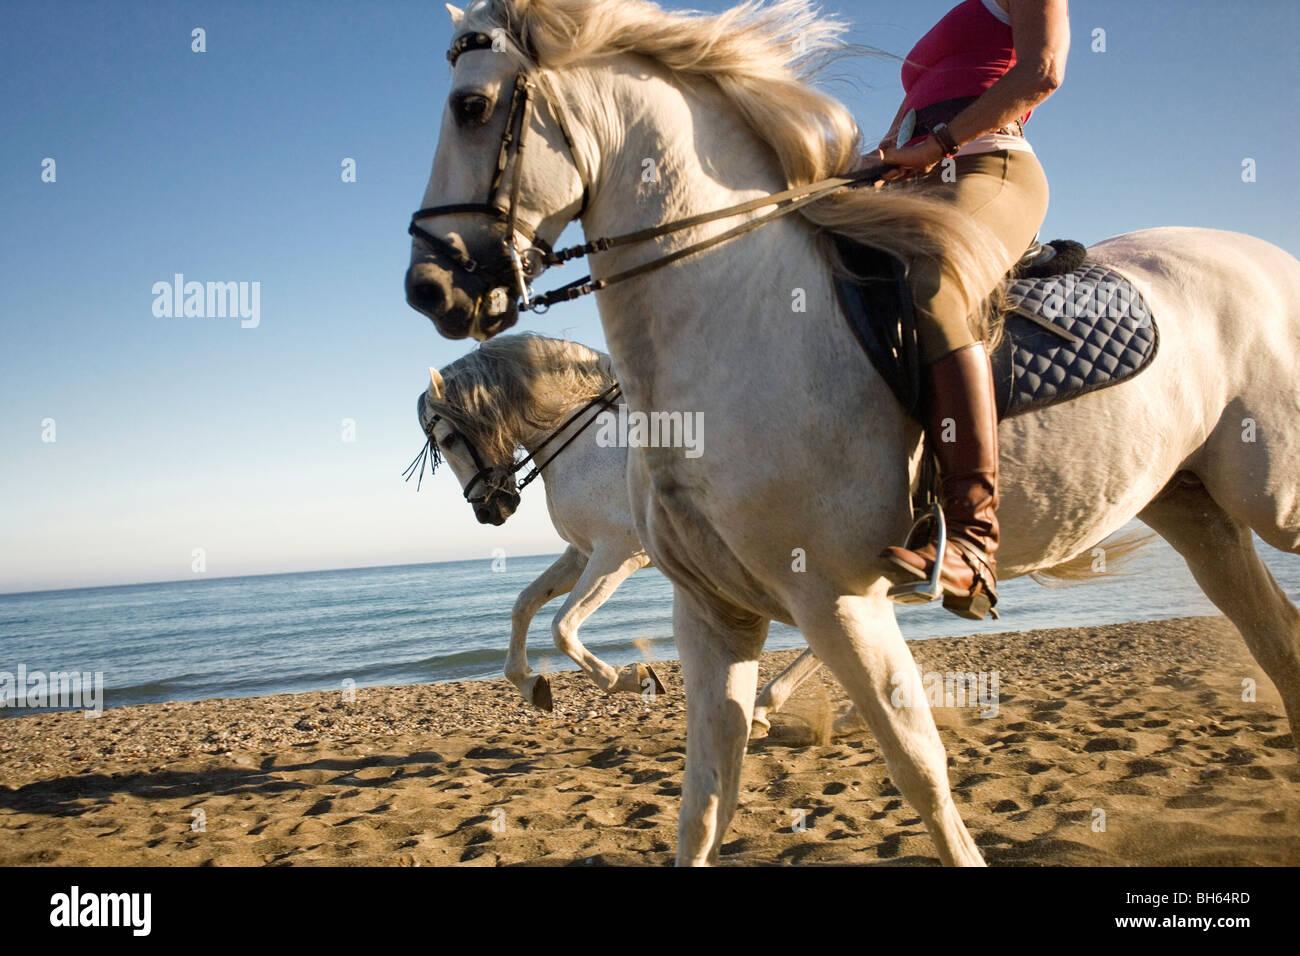 Zwei Frauen Reiten am Strand Stockbild